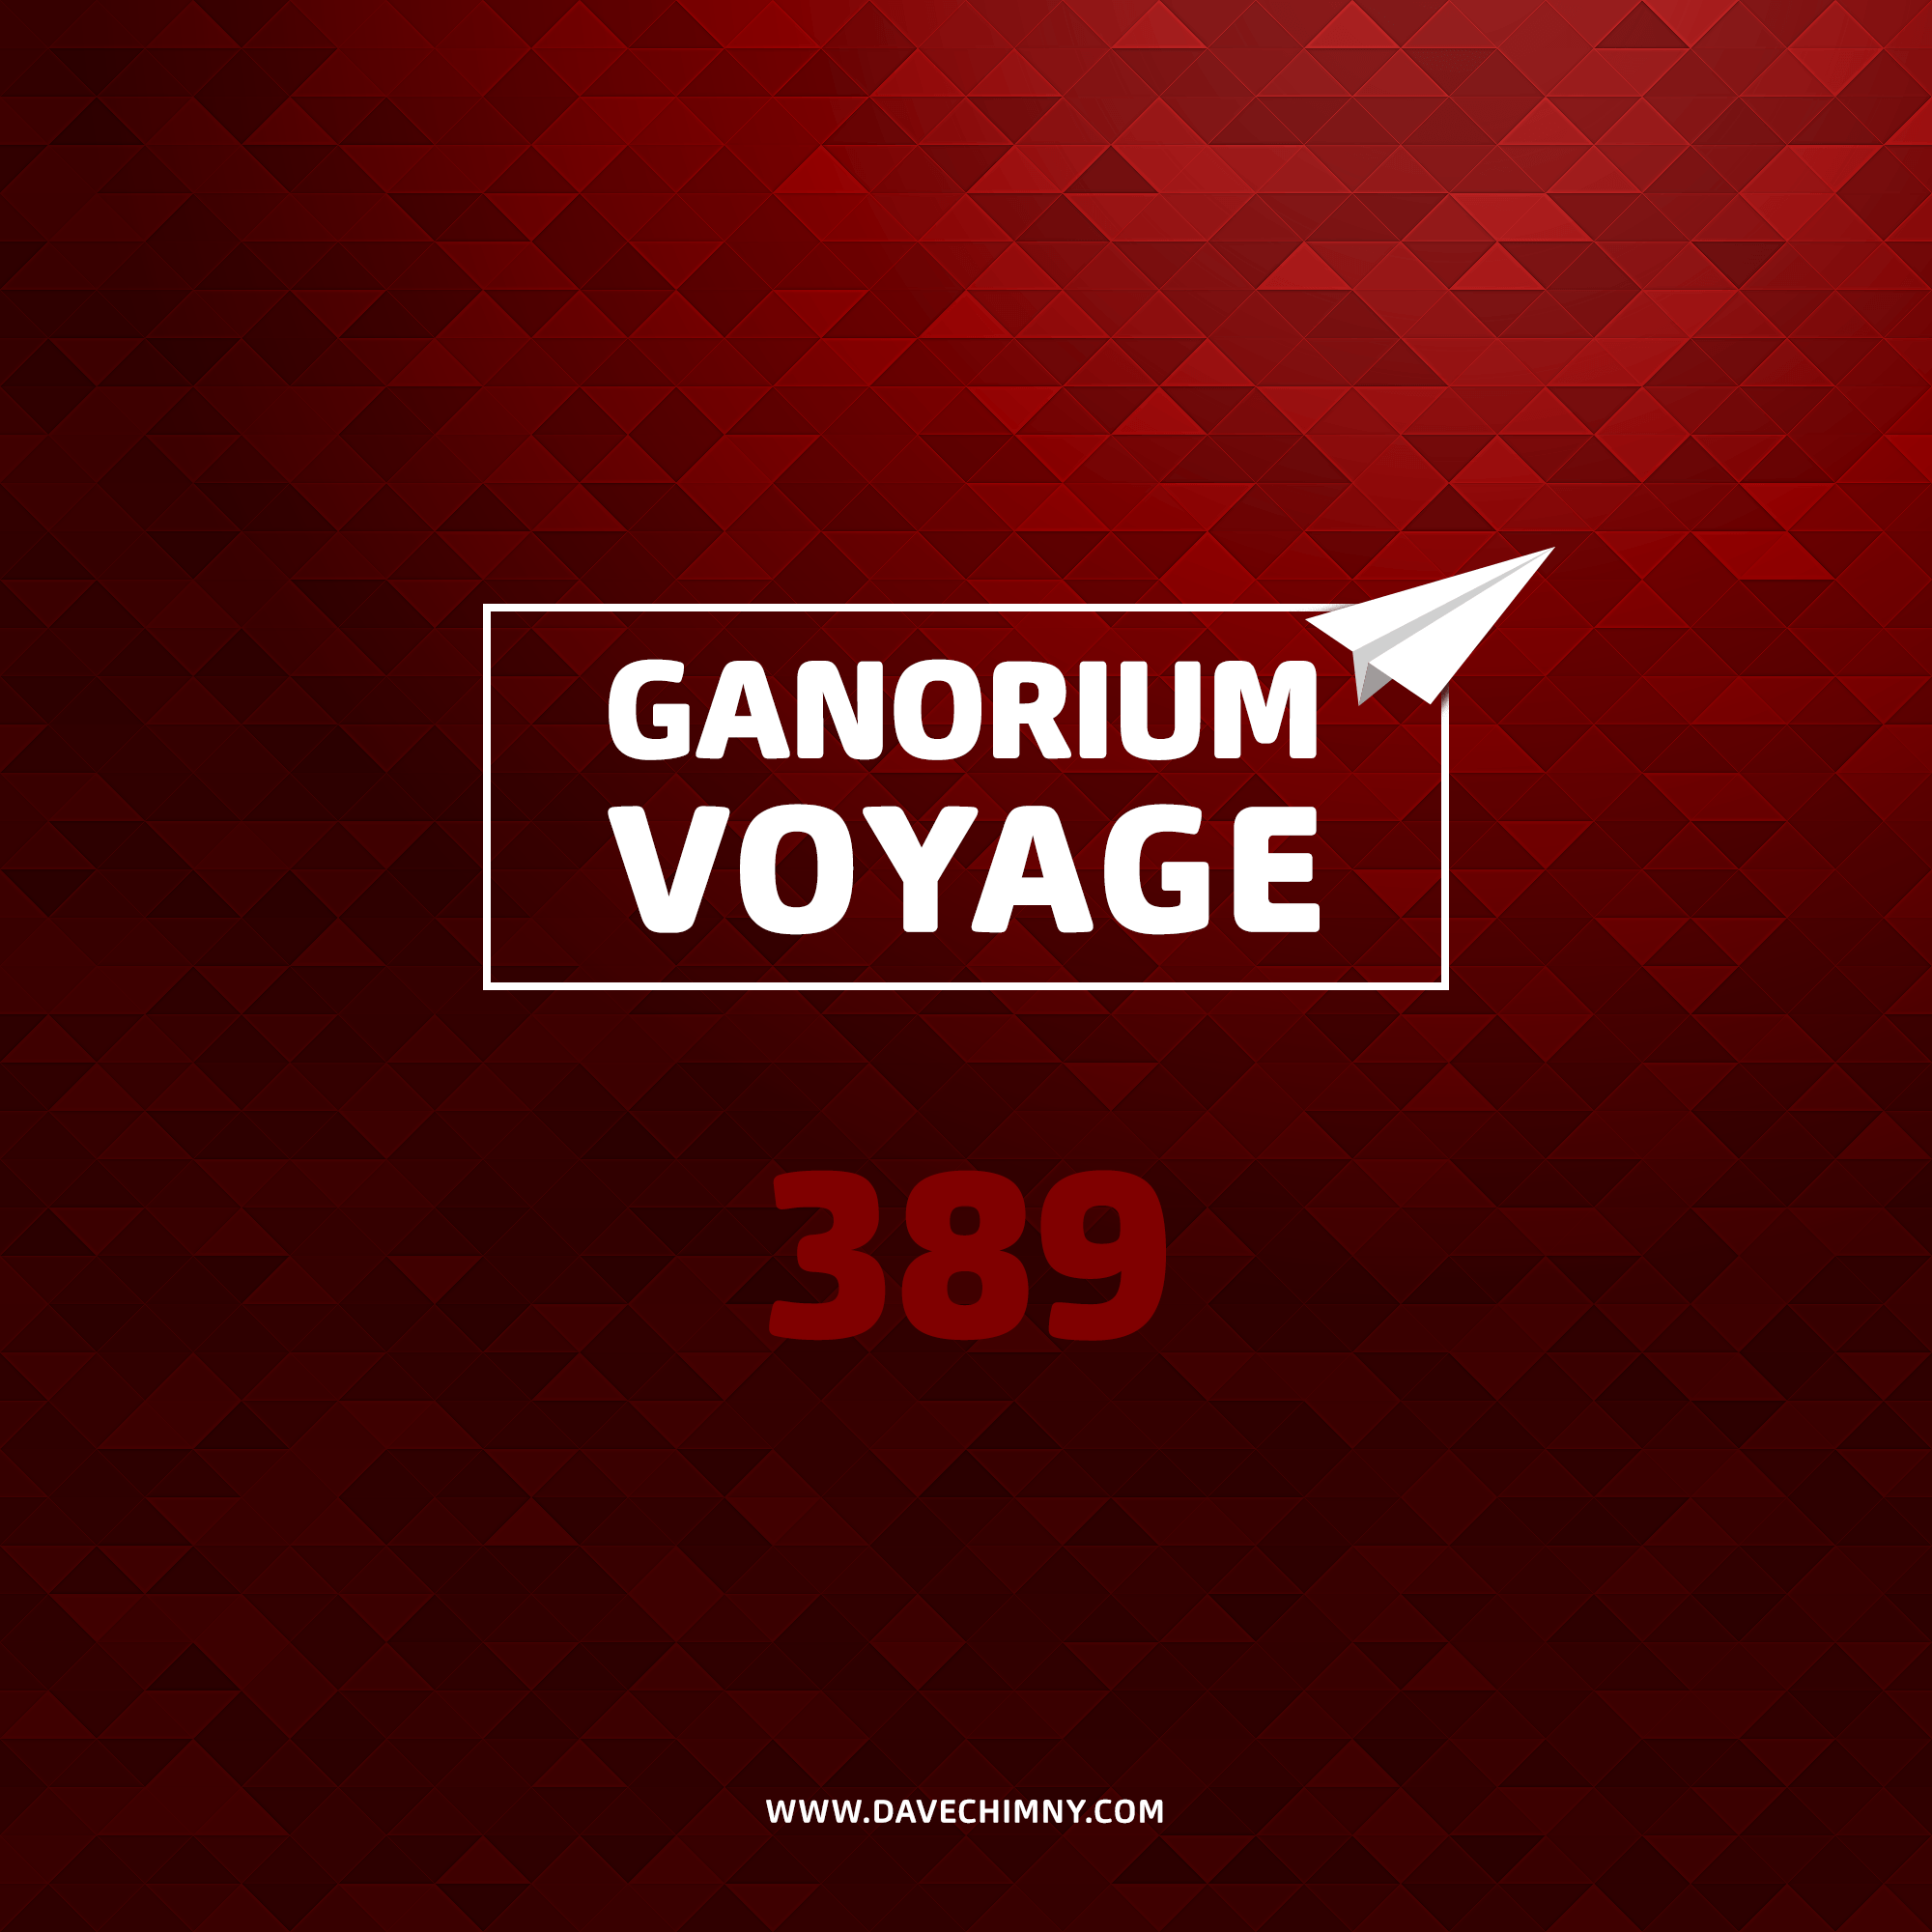 Dave Chimny – Ganorium Voyage 389